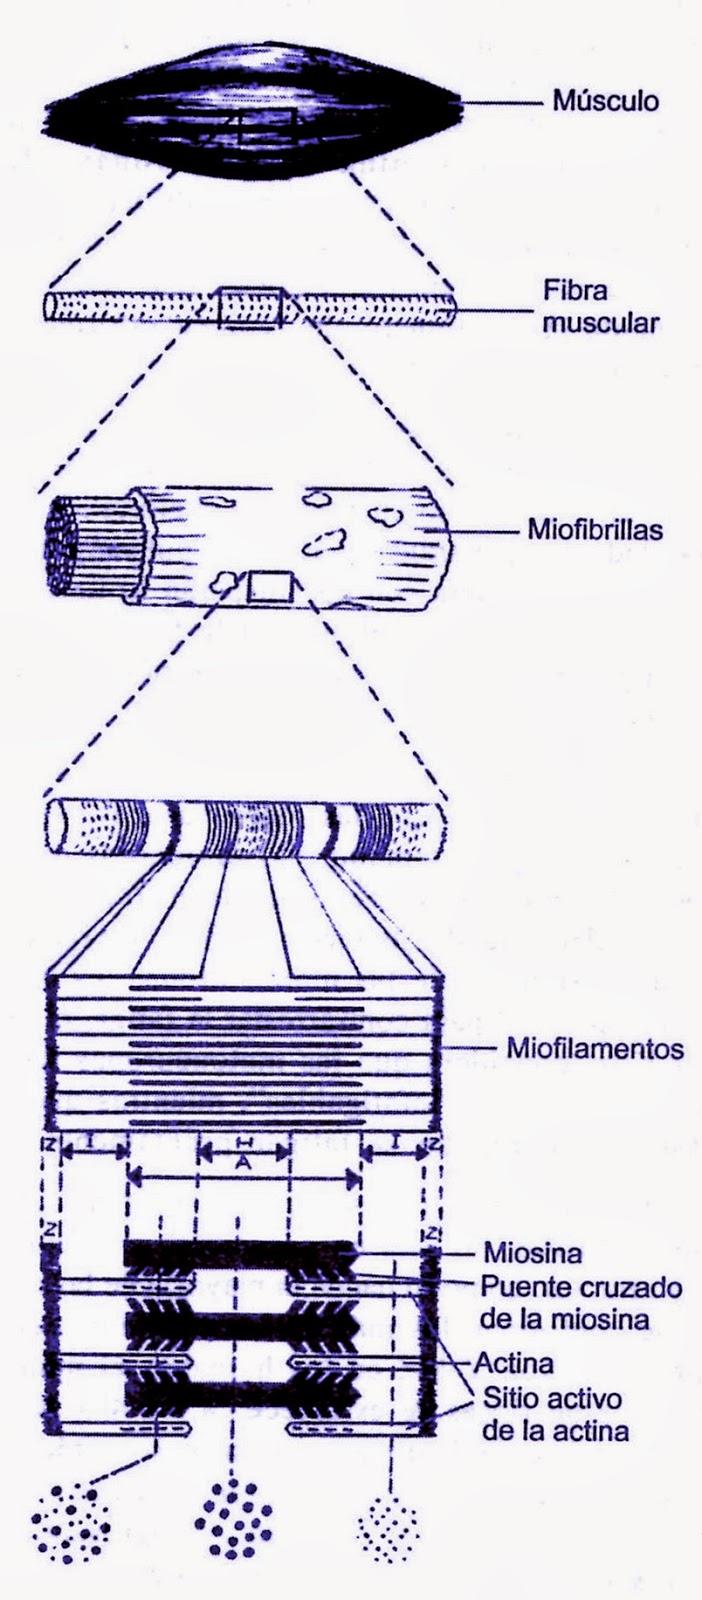 Estructura morfológica de la fibra muscular esquelética